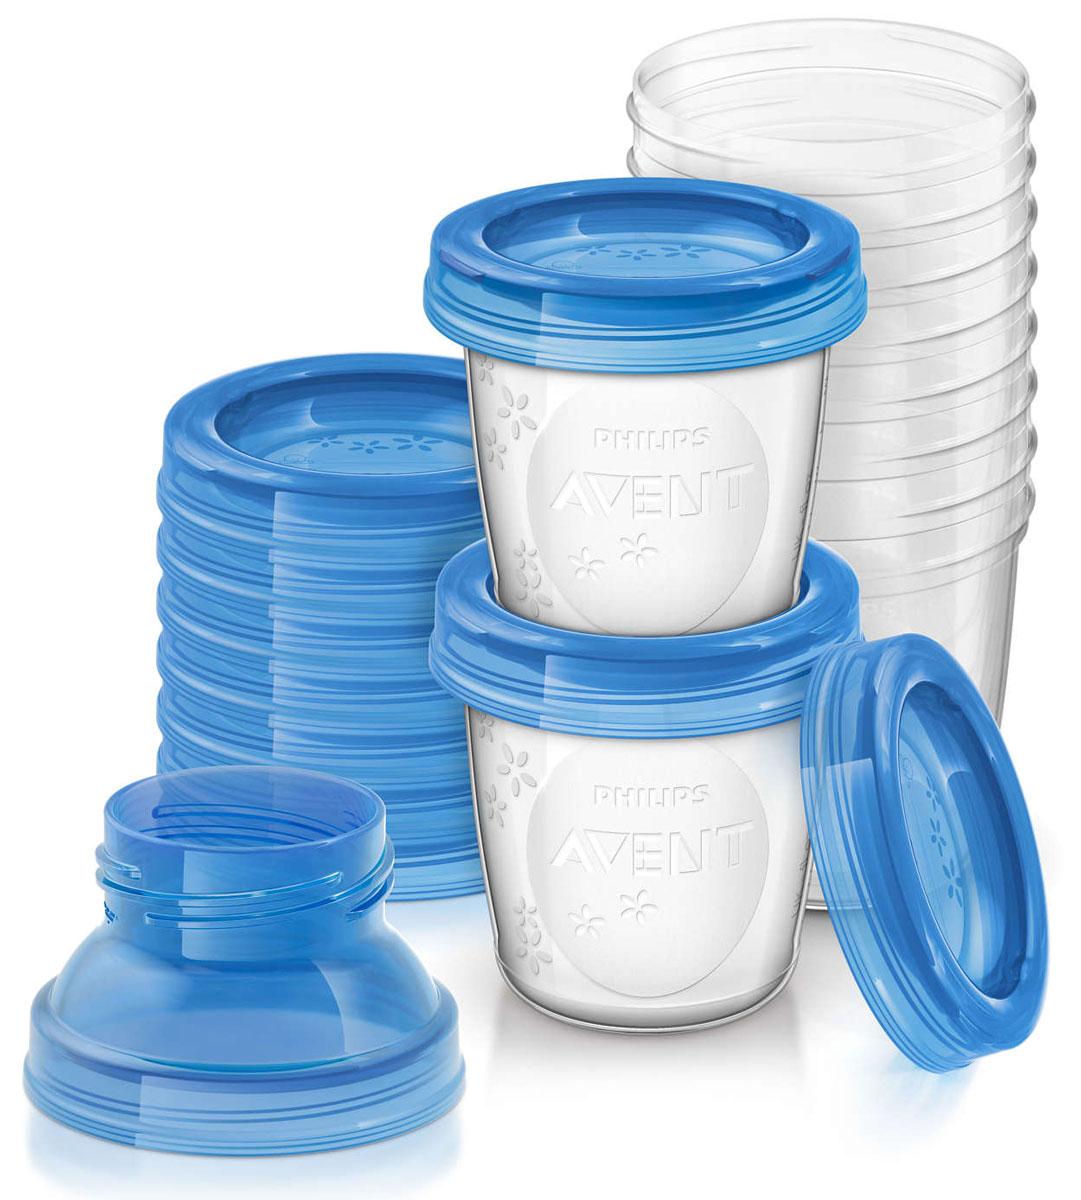 Philips Avent Контейнеры для хранения грудного молока SCF618/10 philips avent контейнеры с крышками для хранения питания 5 шт 240 мл philips avent